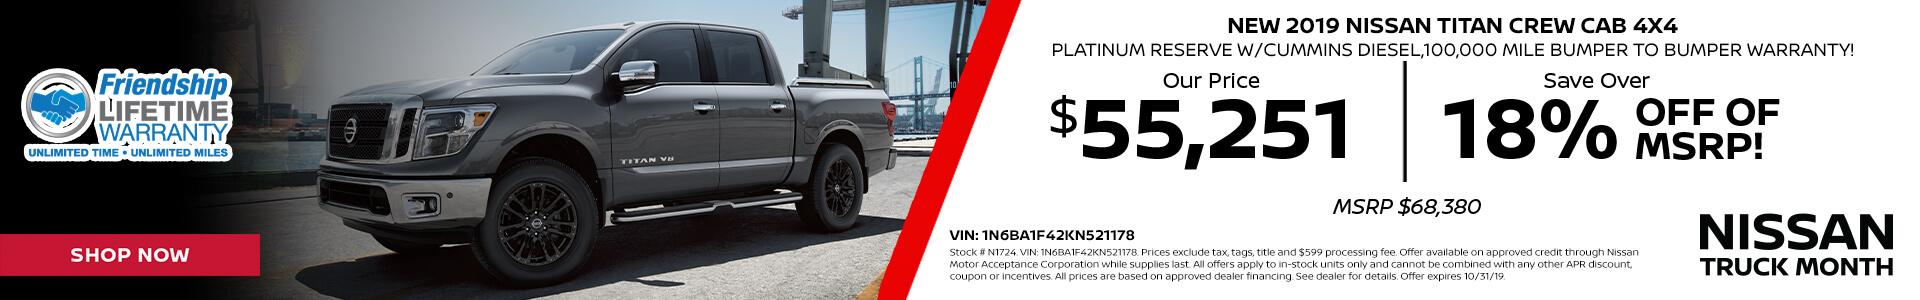 Nissan Titan $55,251 Purchase